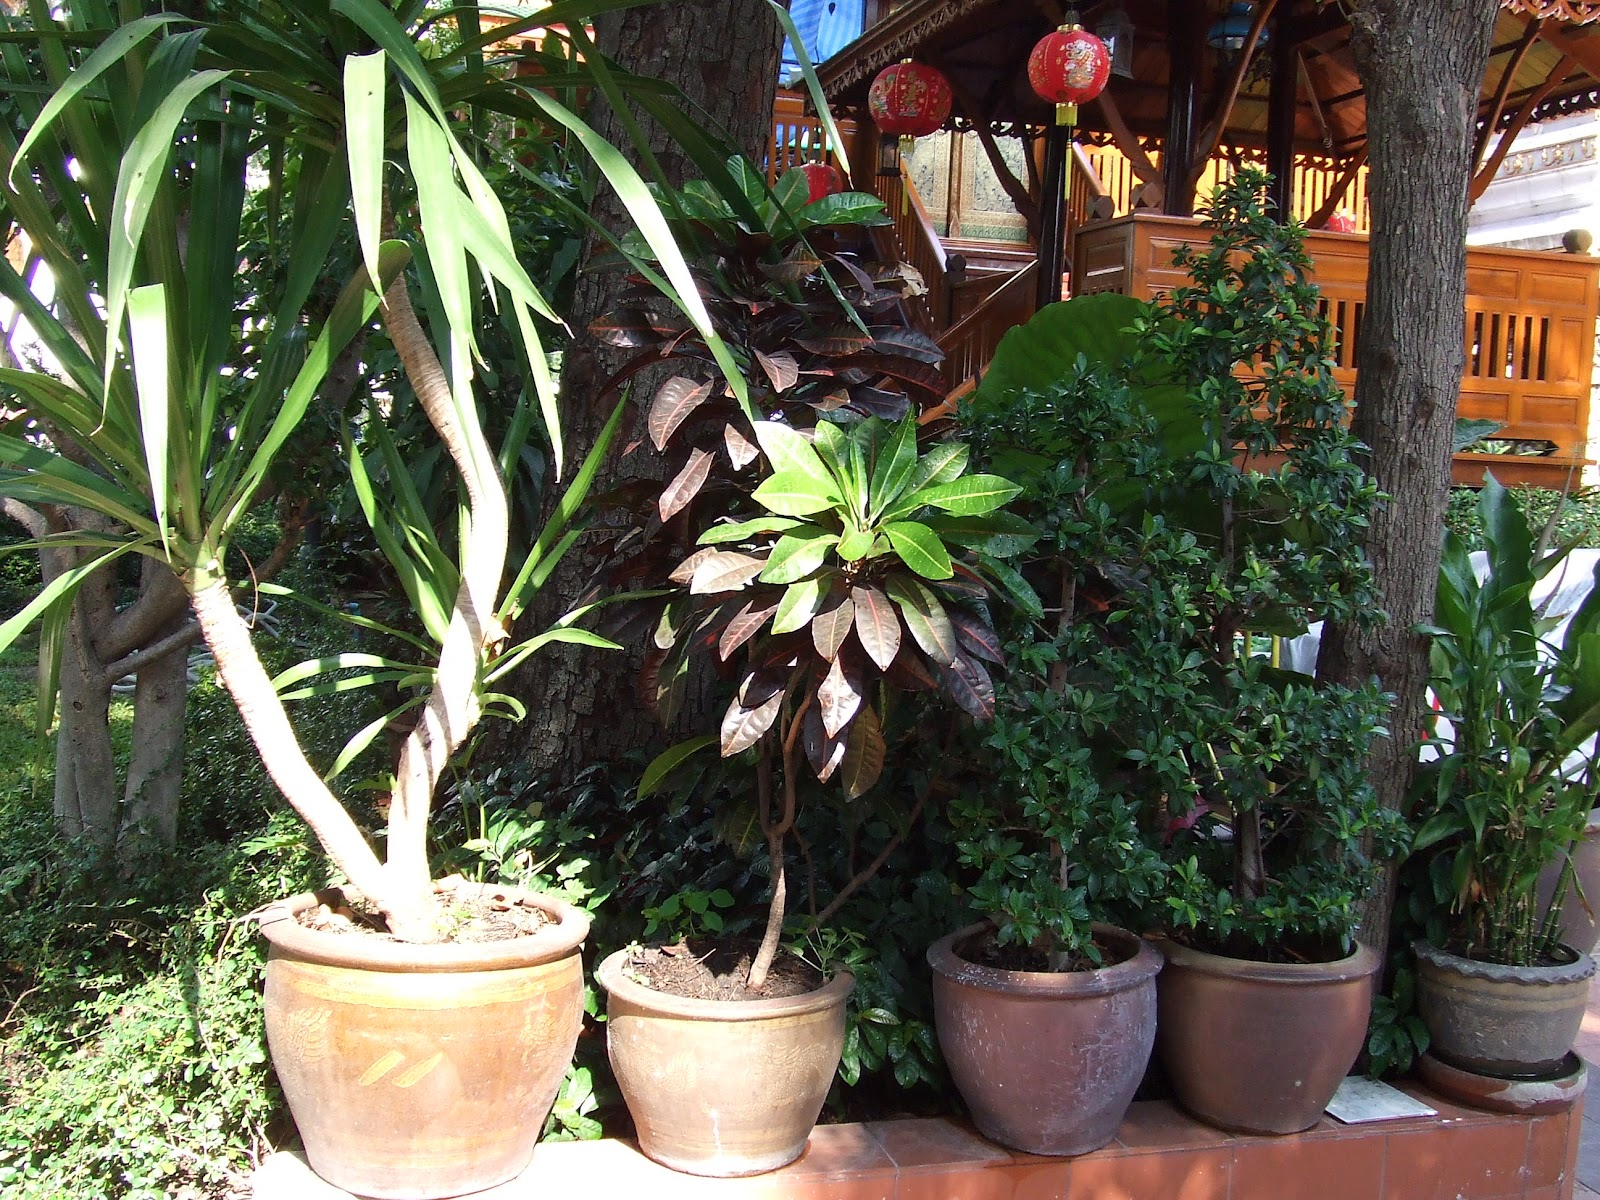 Khun vRo: Nain de jardin made in Thailand!